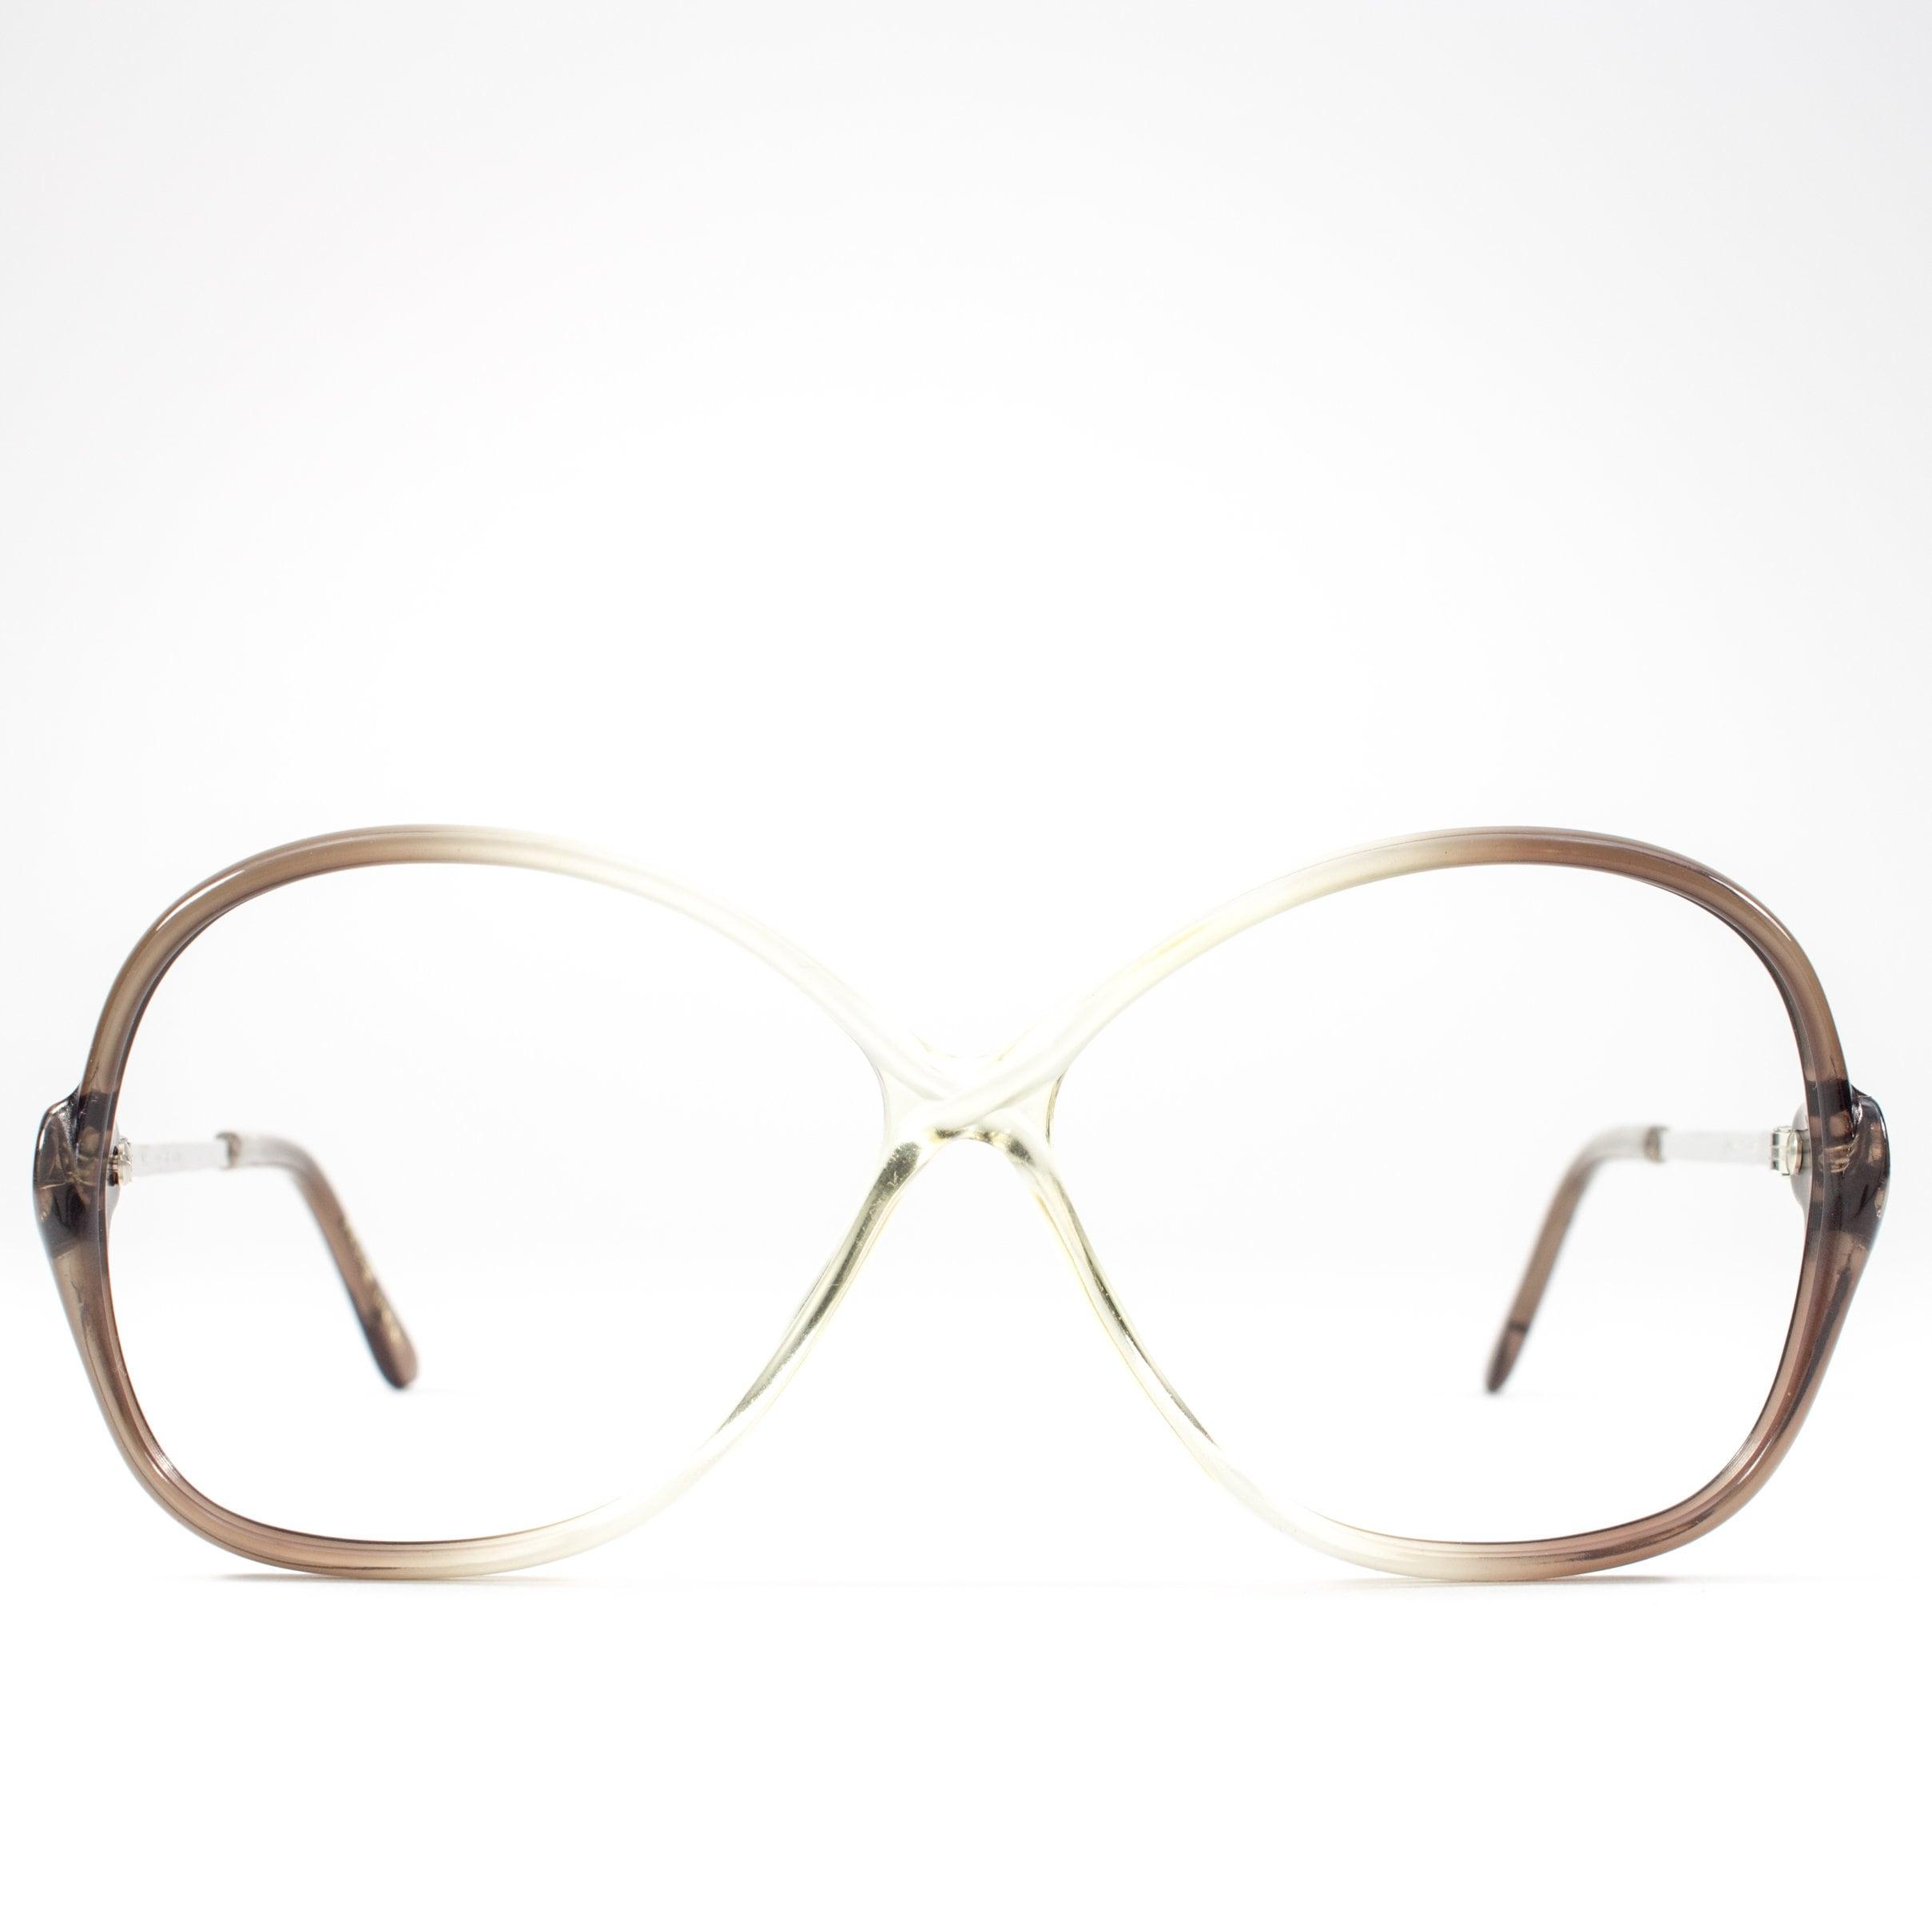 60634c8585 Oversized 1980s Eyeglasses